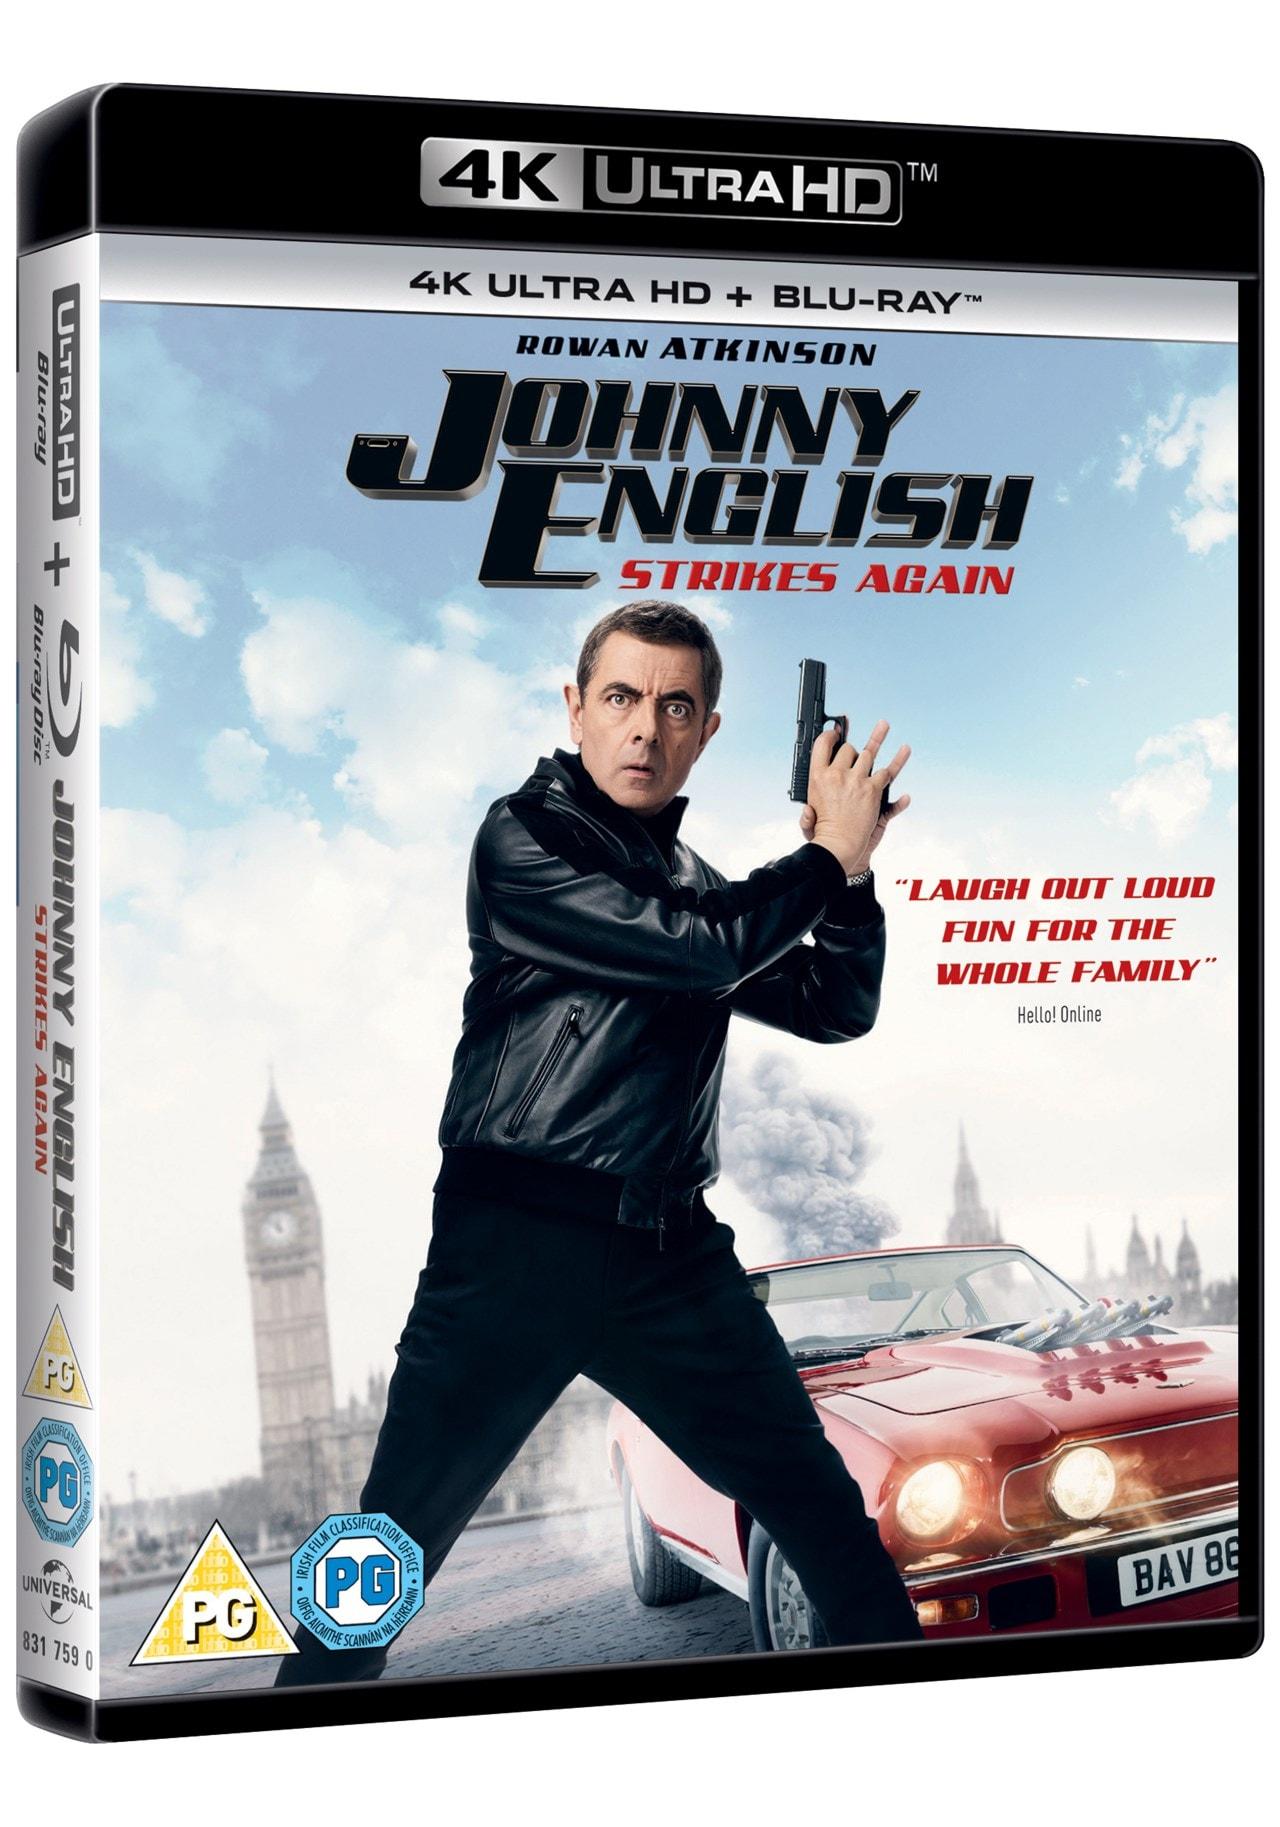 Johnny English Strikes Again - 2